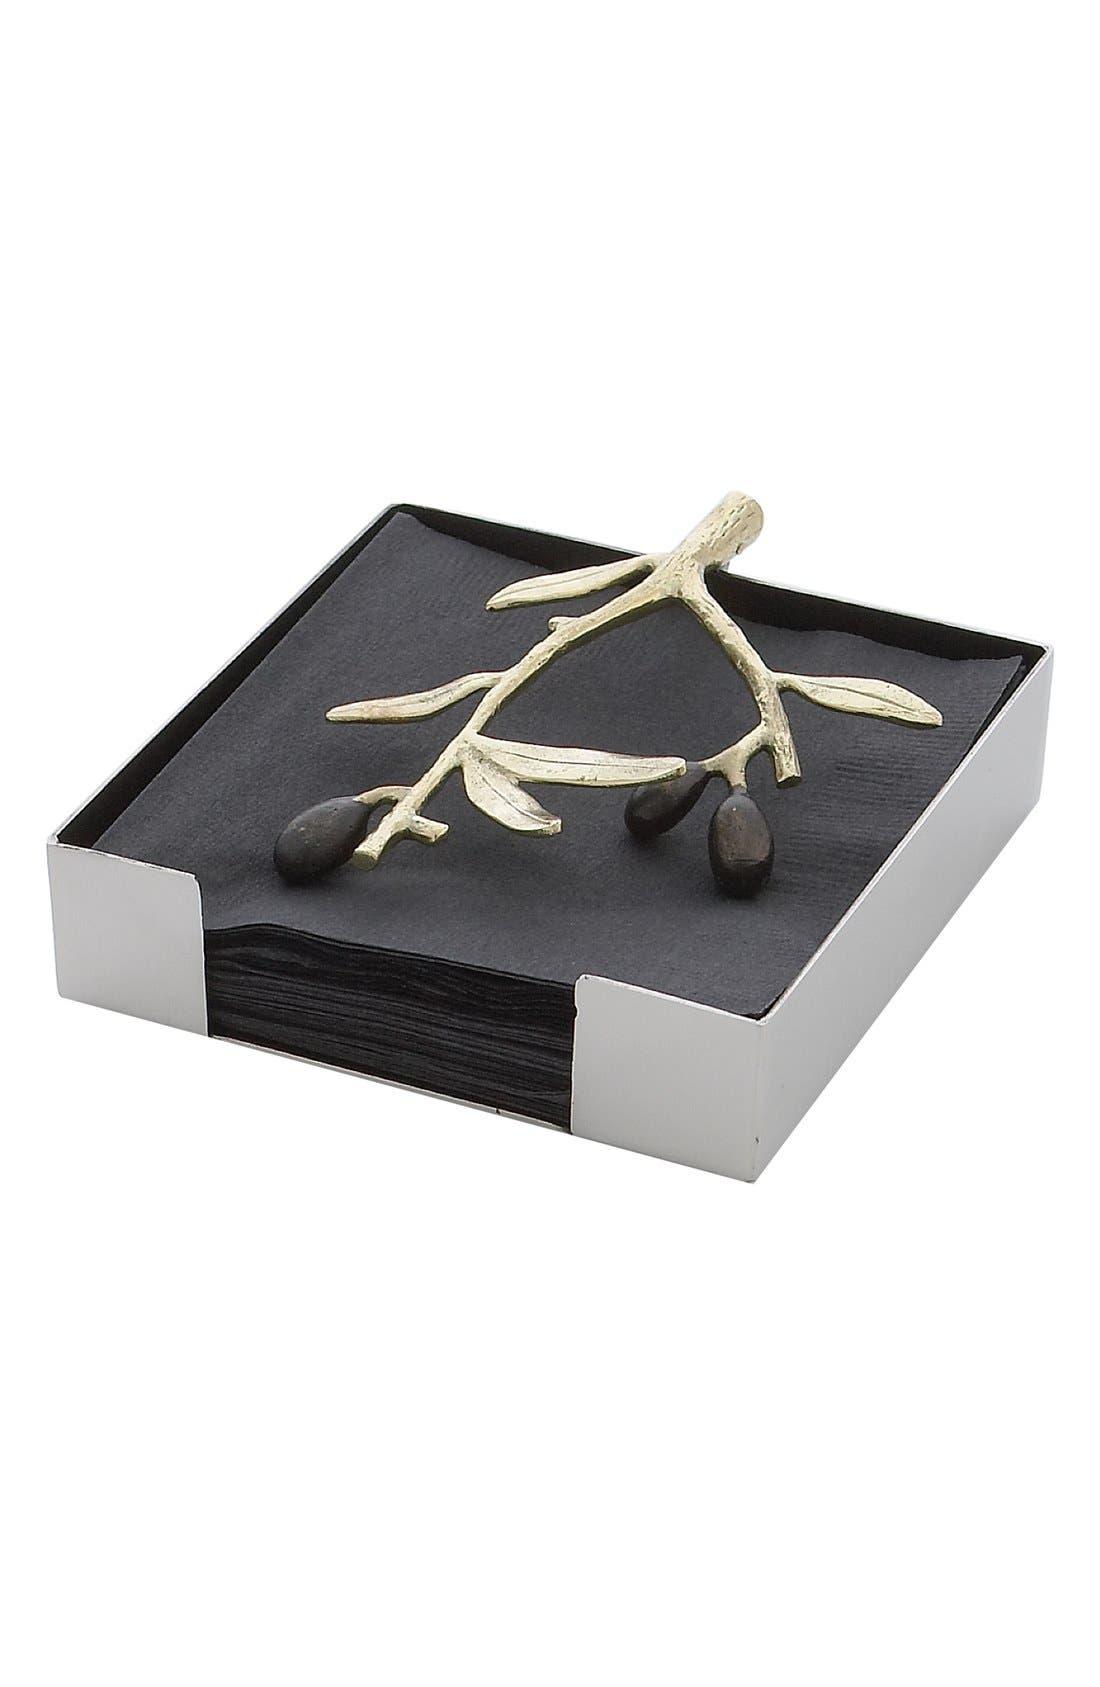 Alternate Image 1 Selected - Michael Aram 'Olive Branch' Napkin Holder